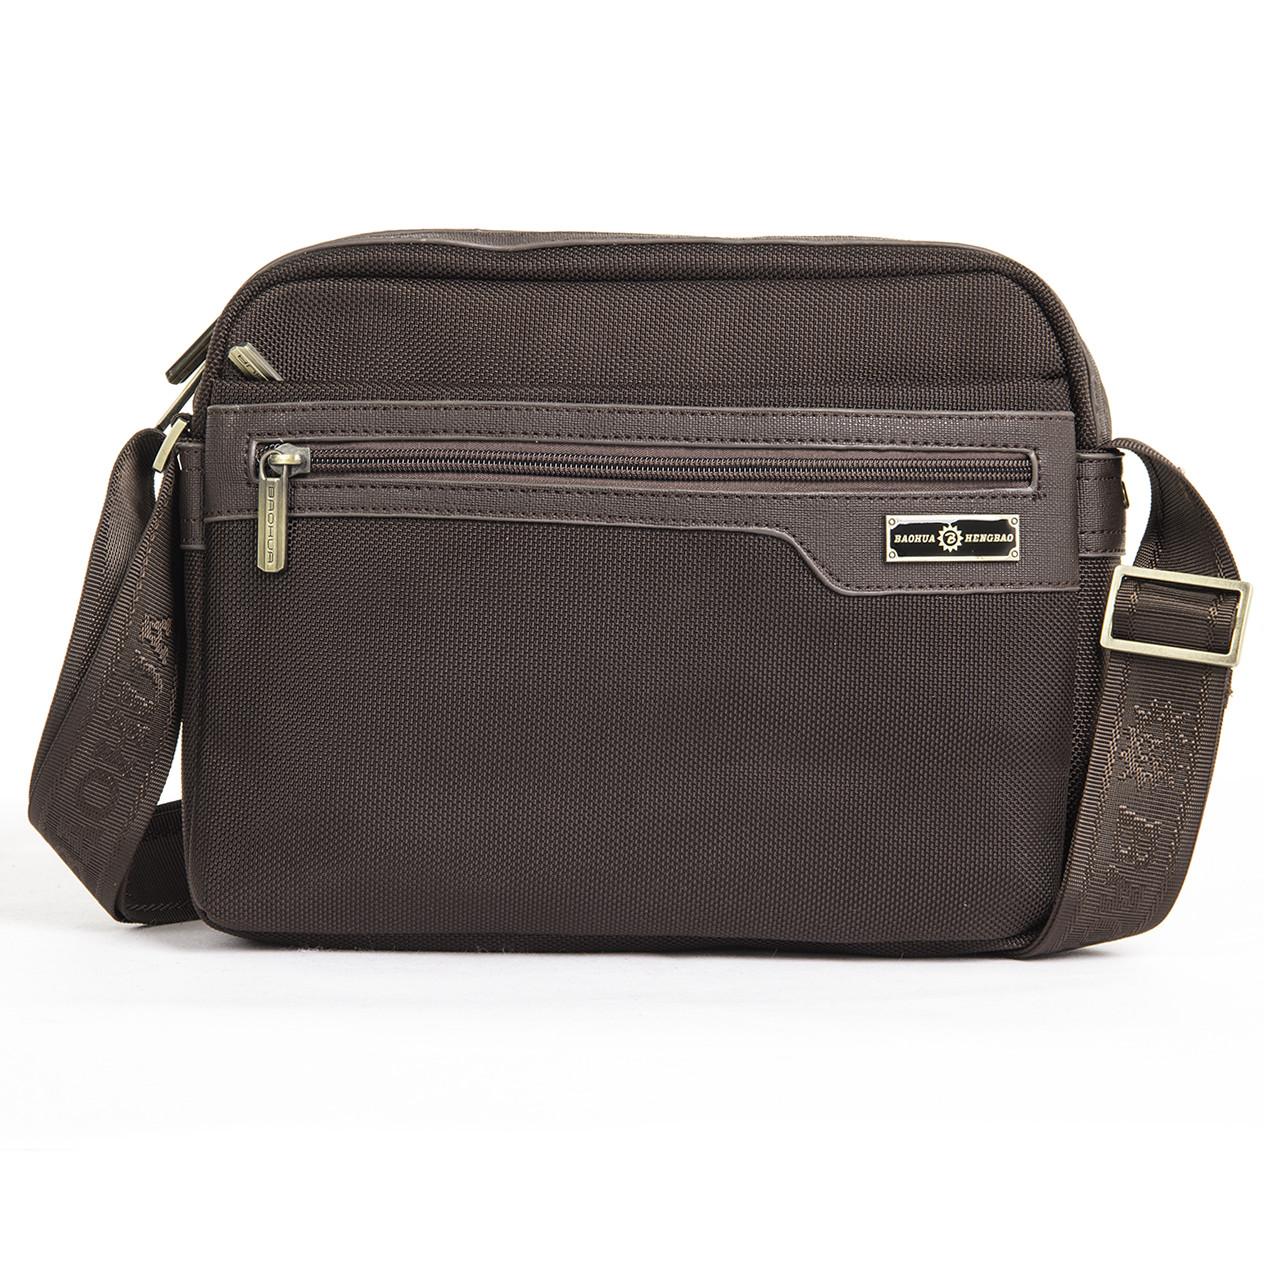 Мужская сумка горизонтальная BAOHUA 28х21х8 ткань Оксфорд ксВН8159-11,5к